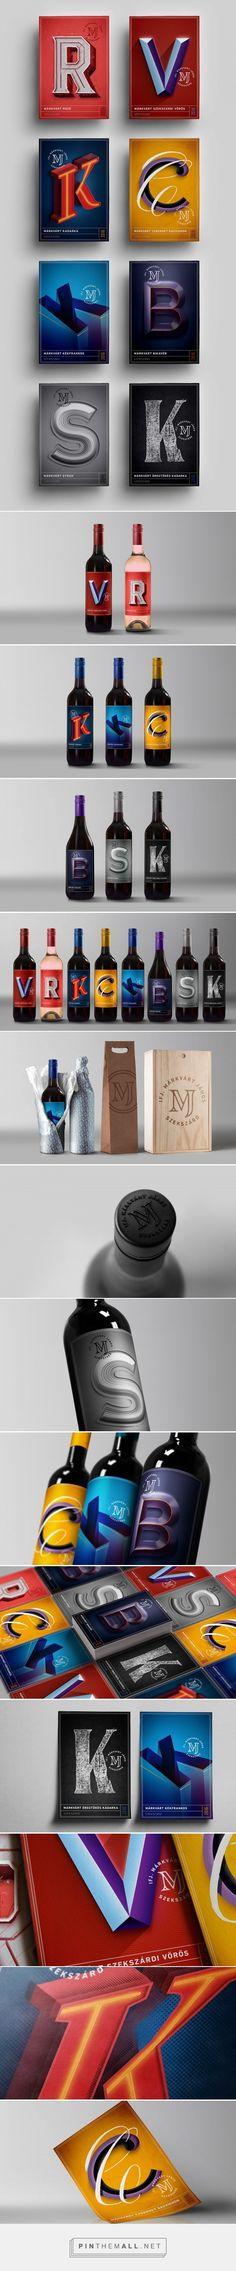 Márkvárt Winery wine label design by Robinson Cursor - https://www.packagingoftheworld.com/2018/03/markvart-winery.html